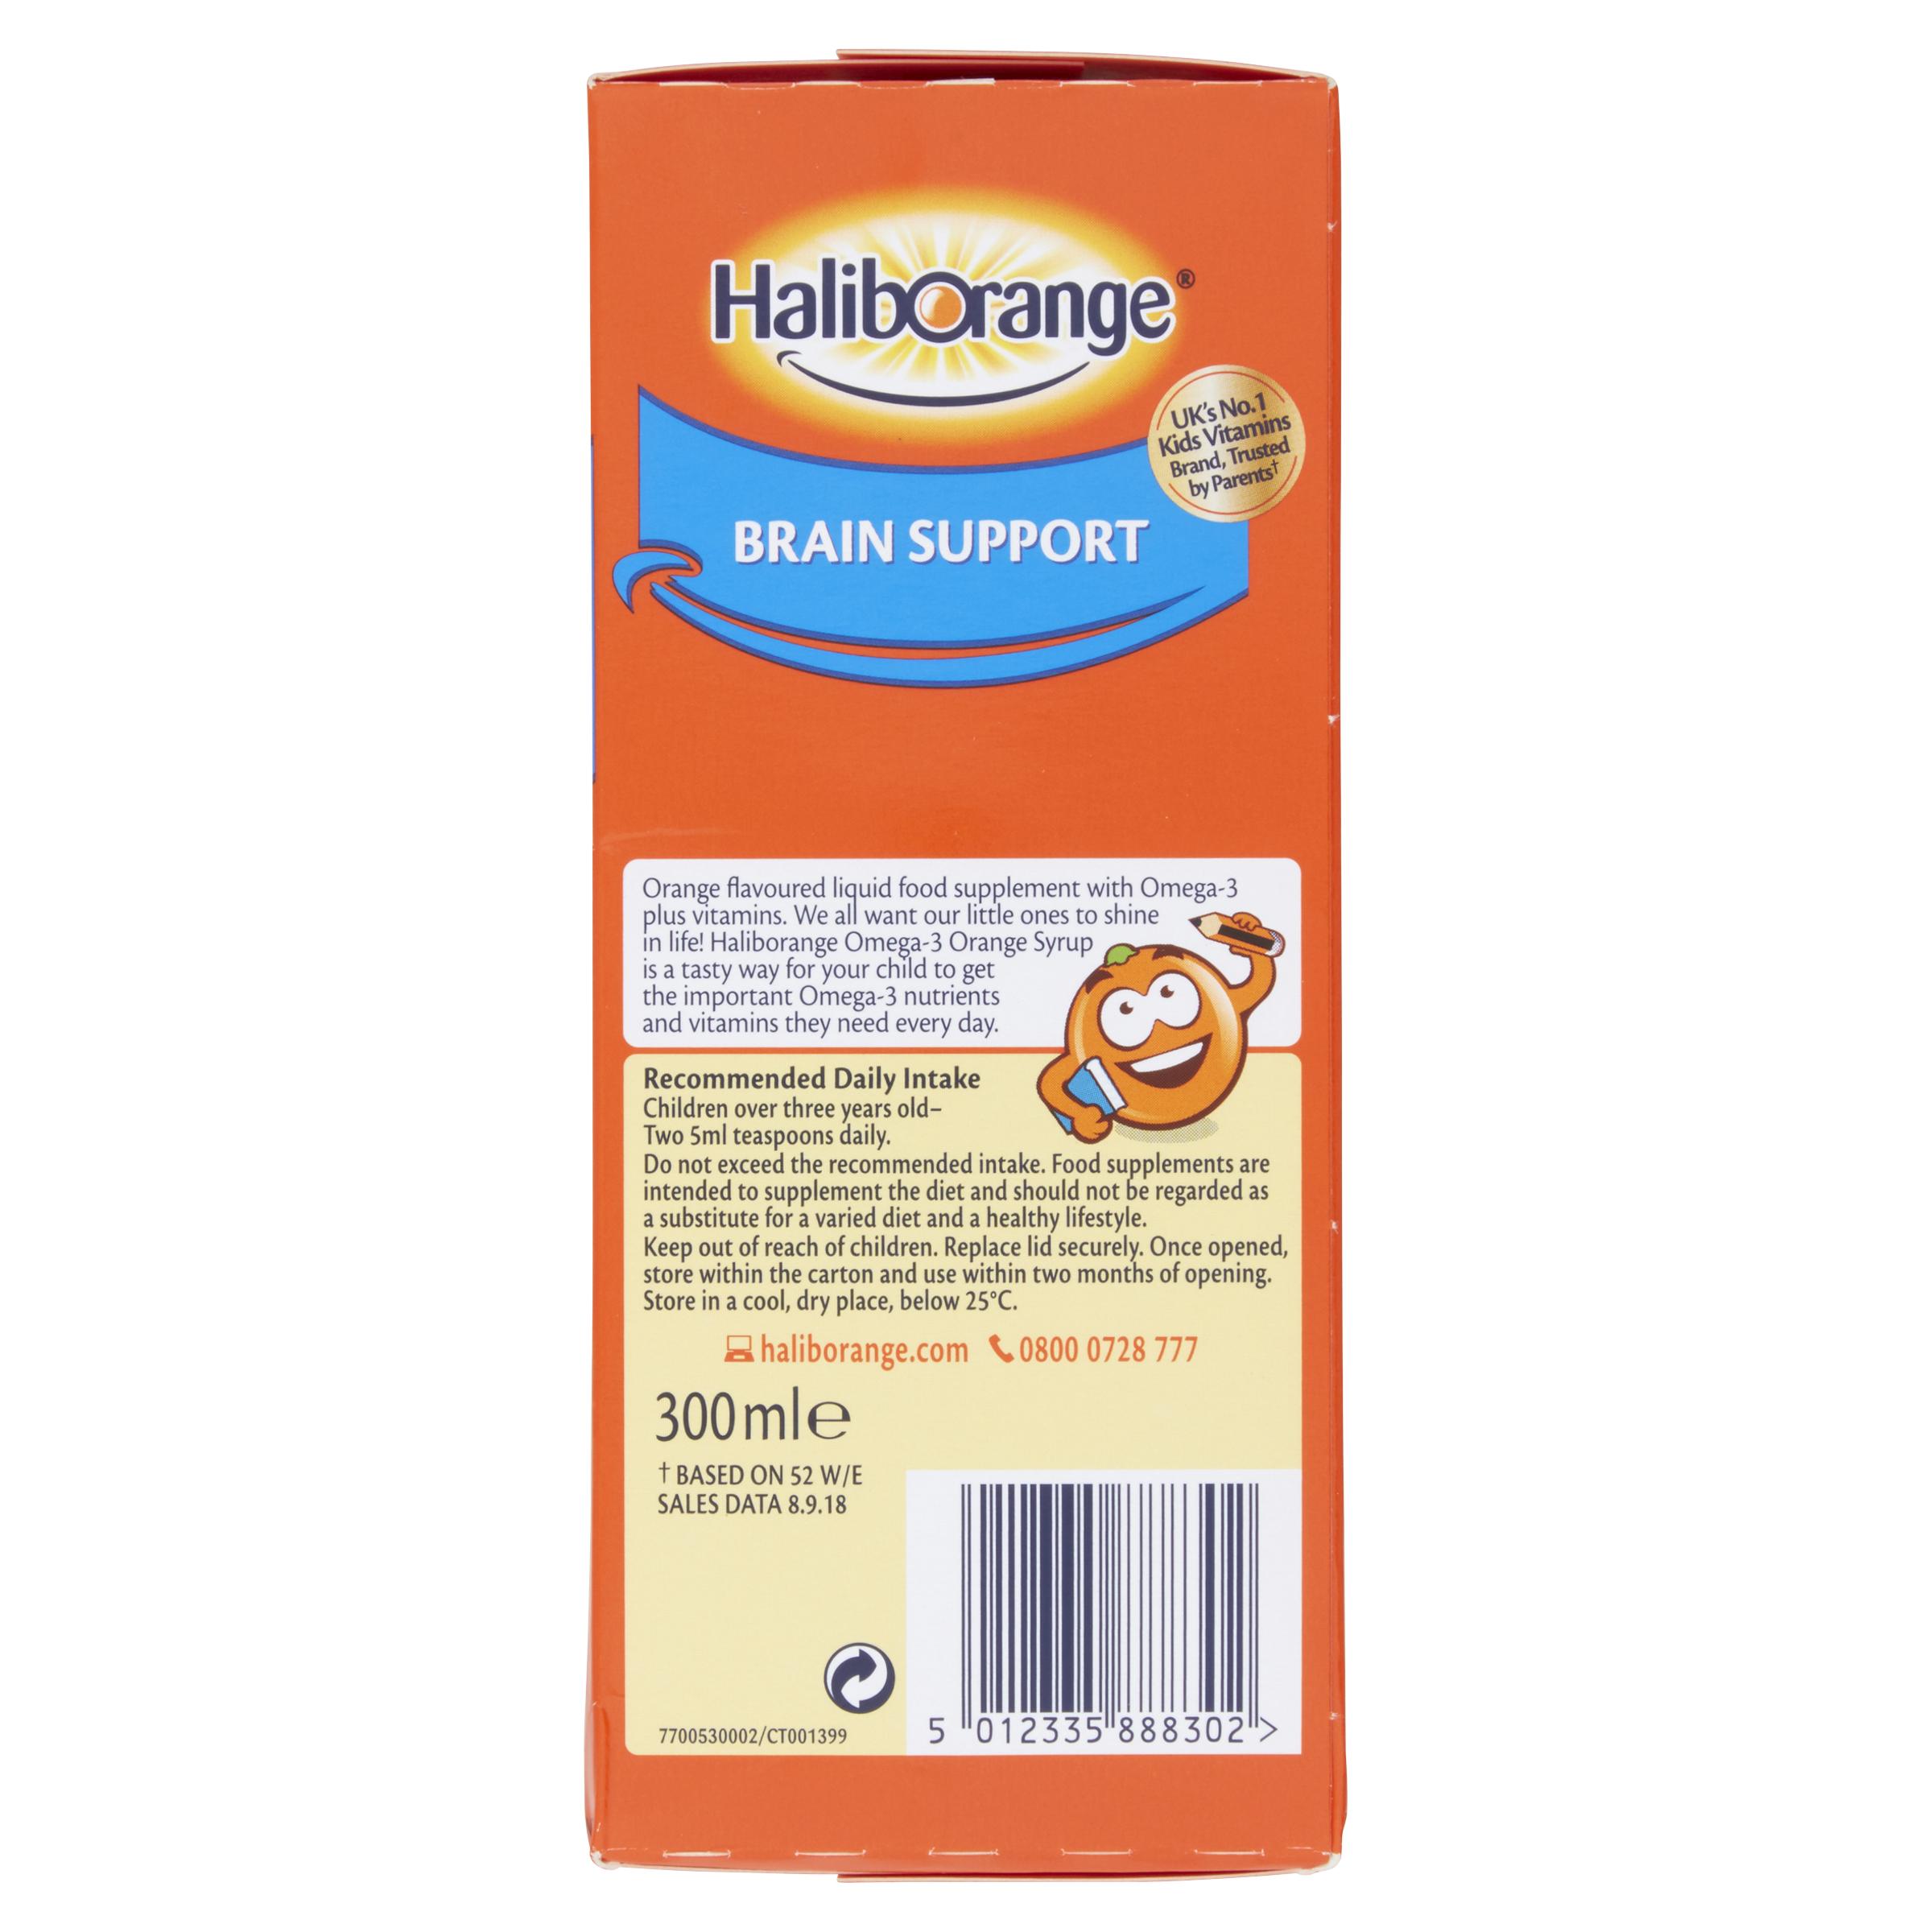 Haliborange Omega 3 Syrup Orange